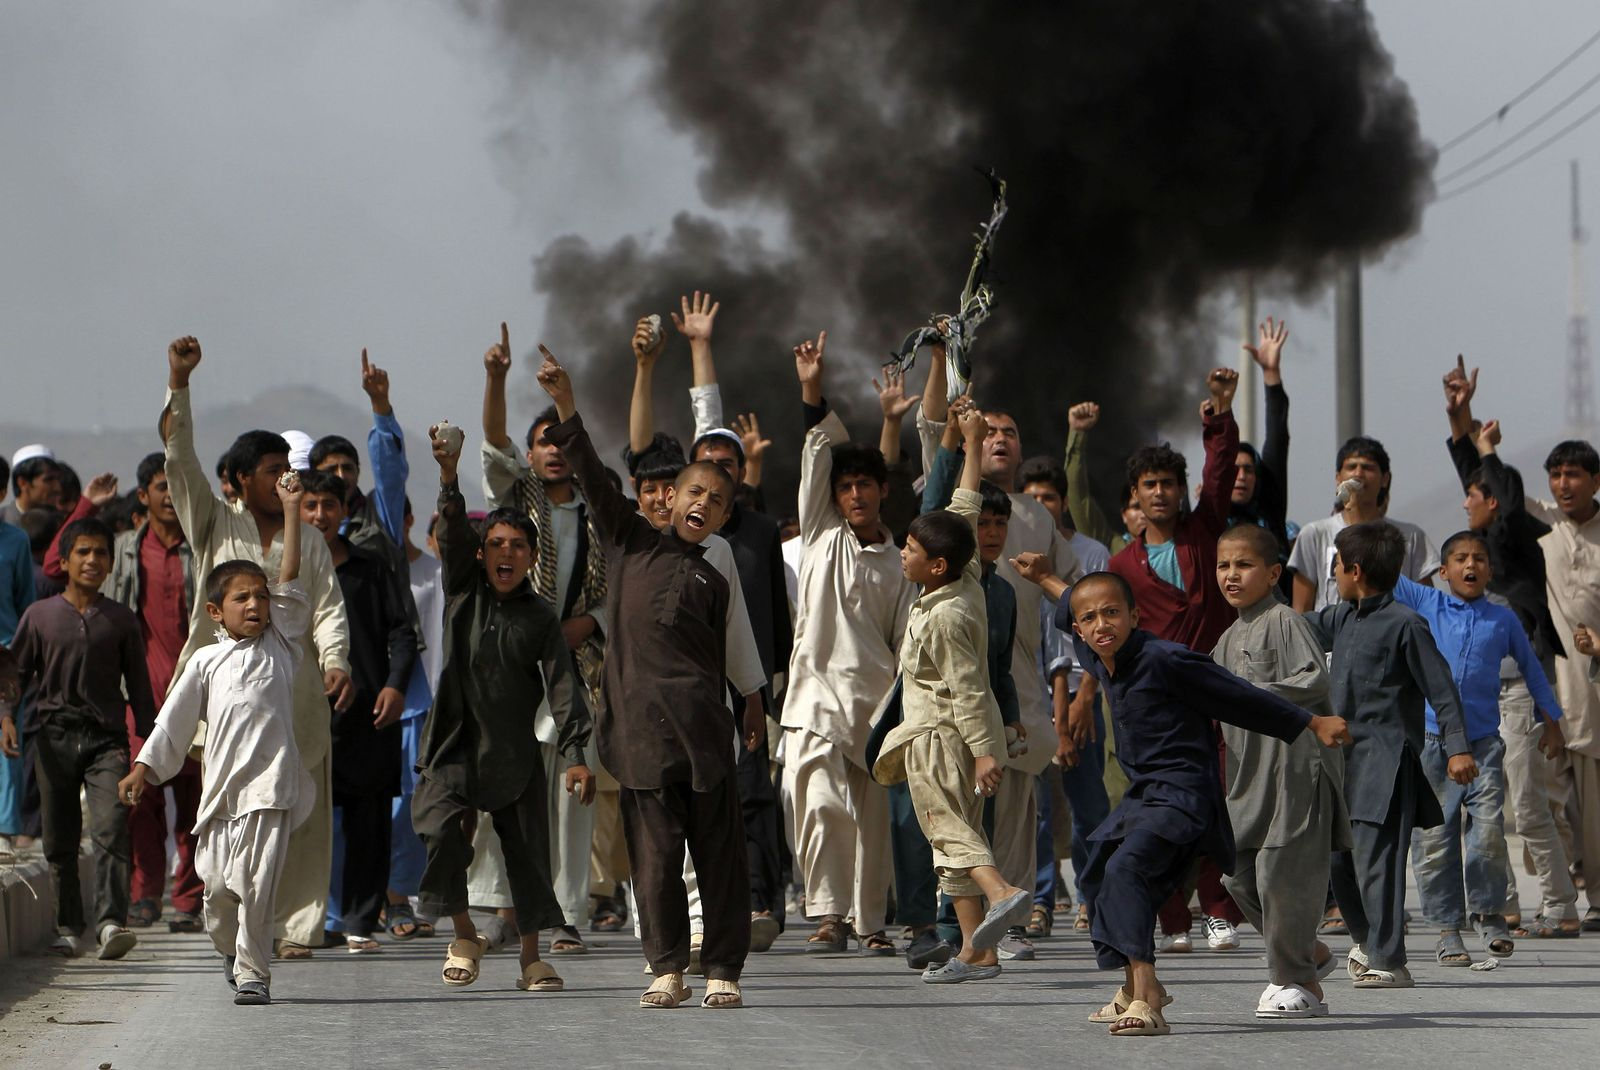 XXL Afghanistan/ Mohammed Film